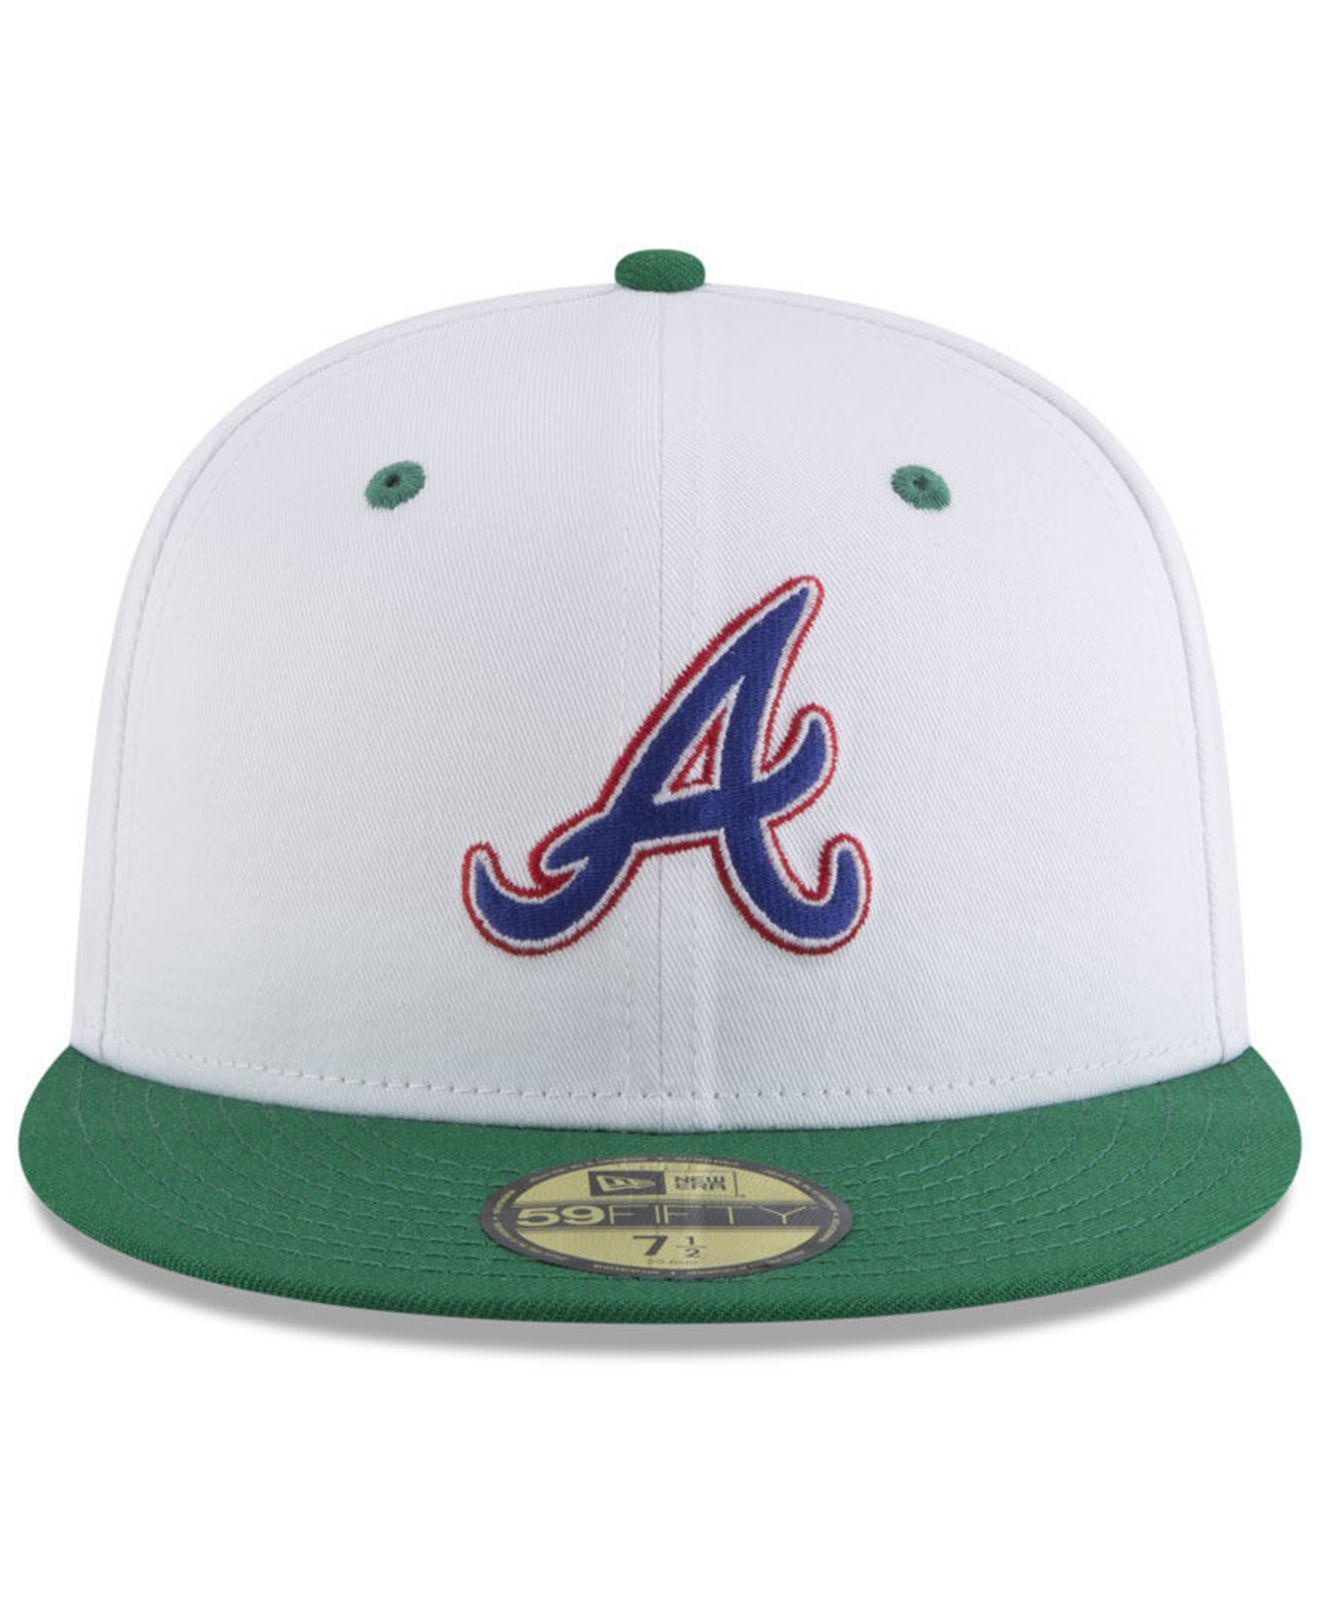 the best attitude 580e9 0b894 ... discount code for lyst ktz atlanta braves retro diamond 59fifty fitted  cap in white for men